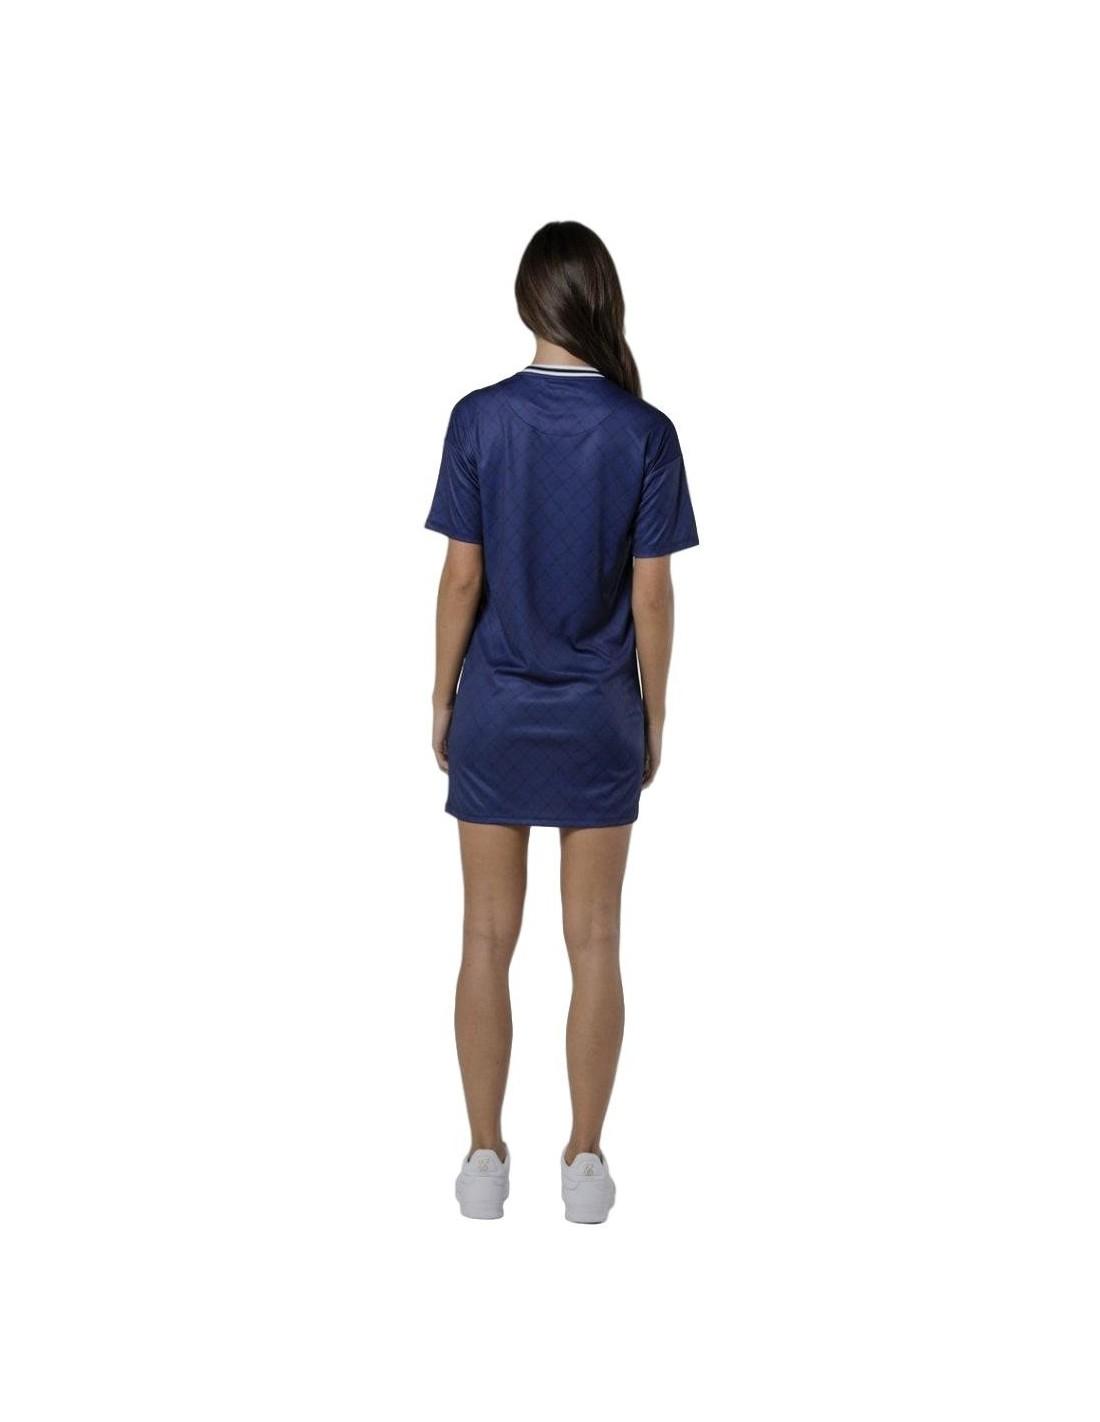 T-Shirt Antony Morato Grey Sport With Plate